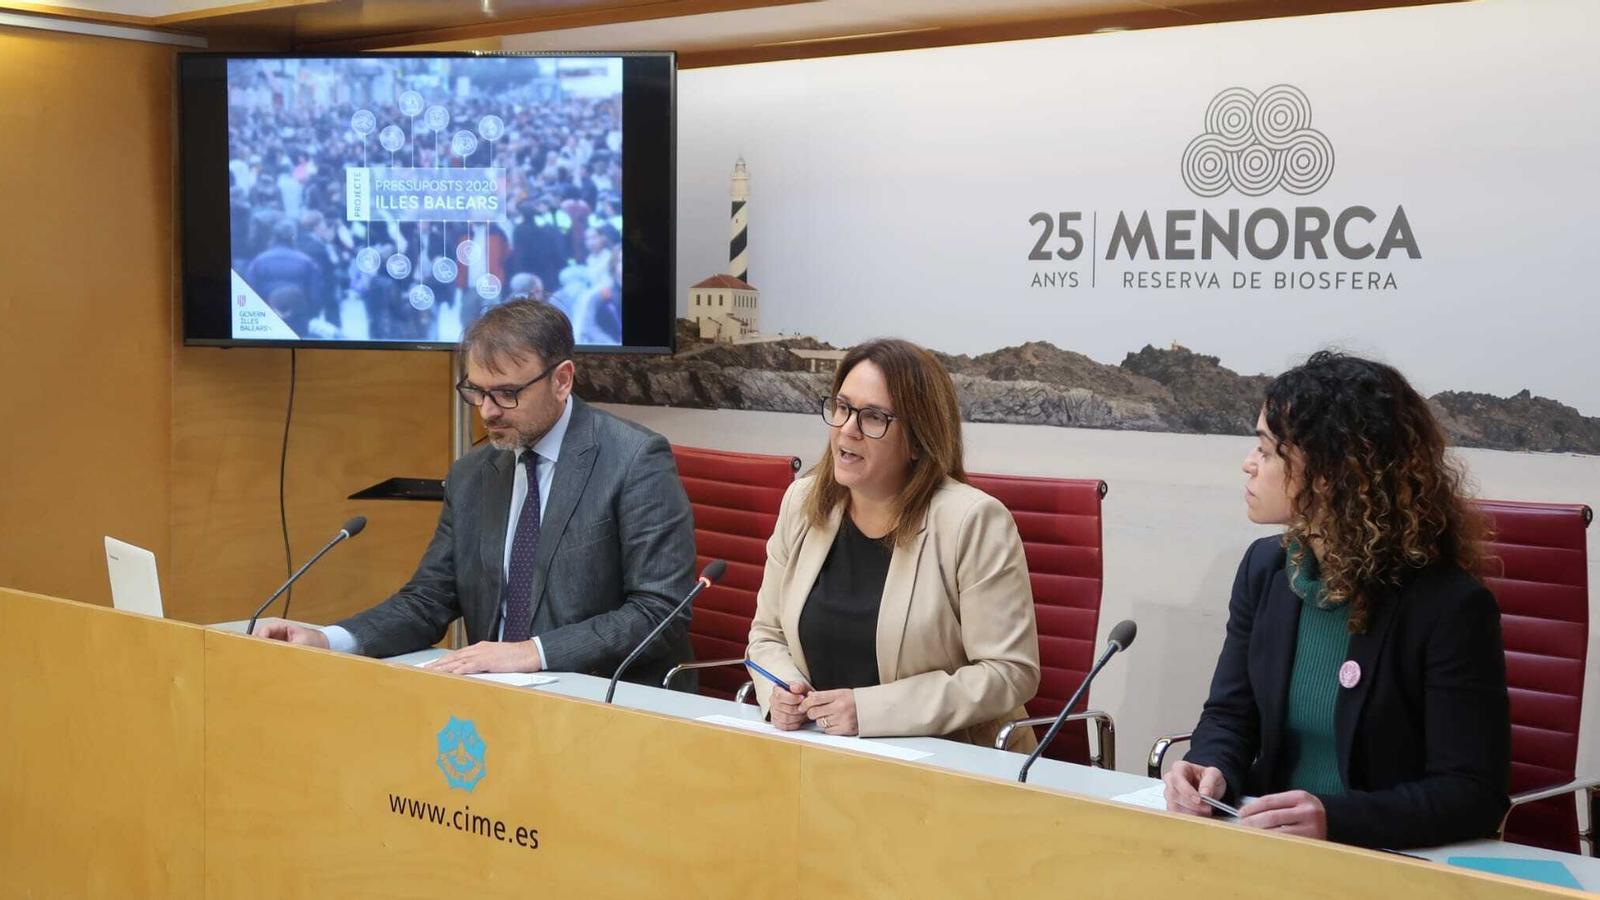 La presidenta Susana Mora i la consellera d'Hisenda del Govern Balear, Rosario Sánchez han detallat els pressupostos.